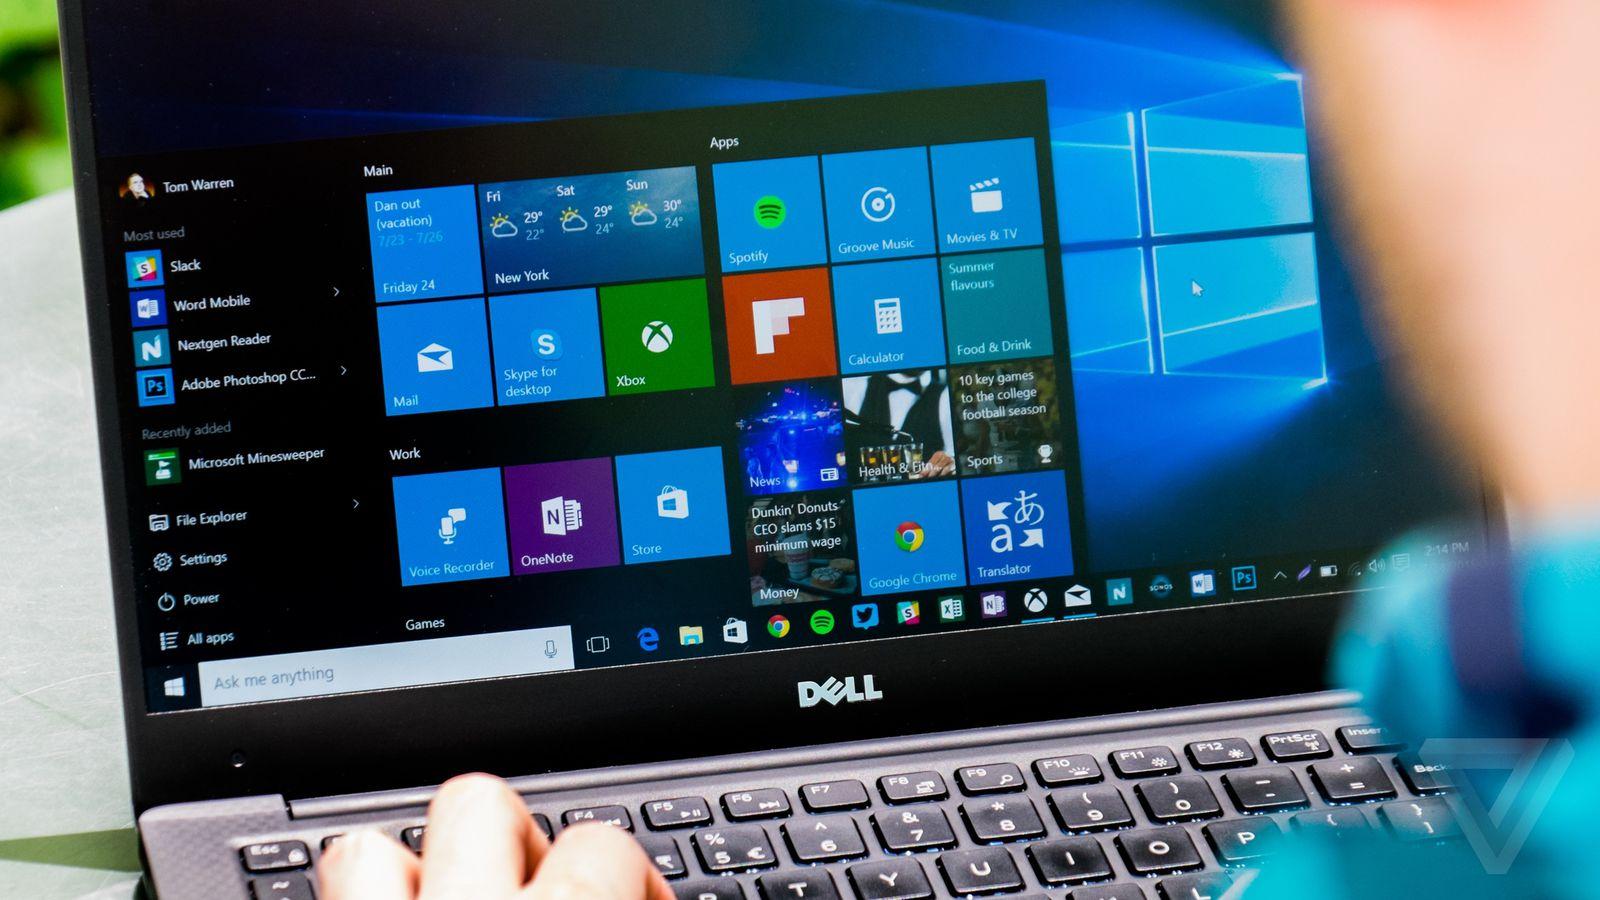 300 million machines are now running Windows 10